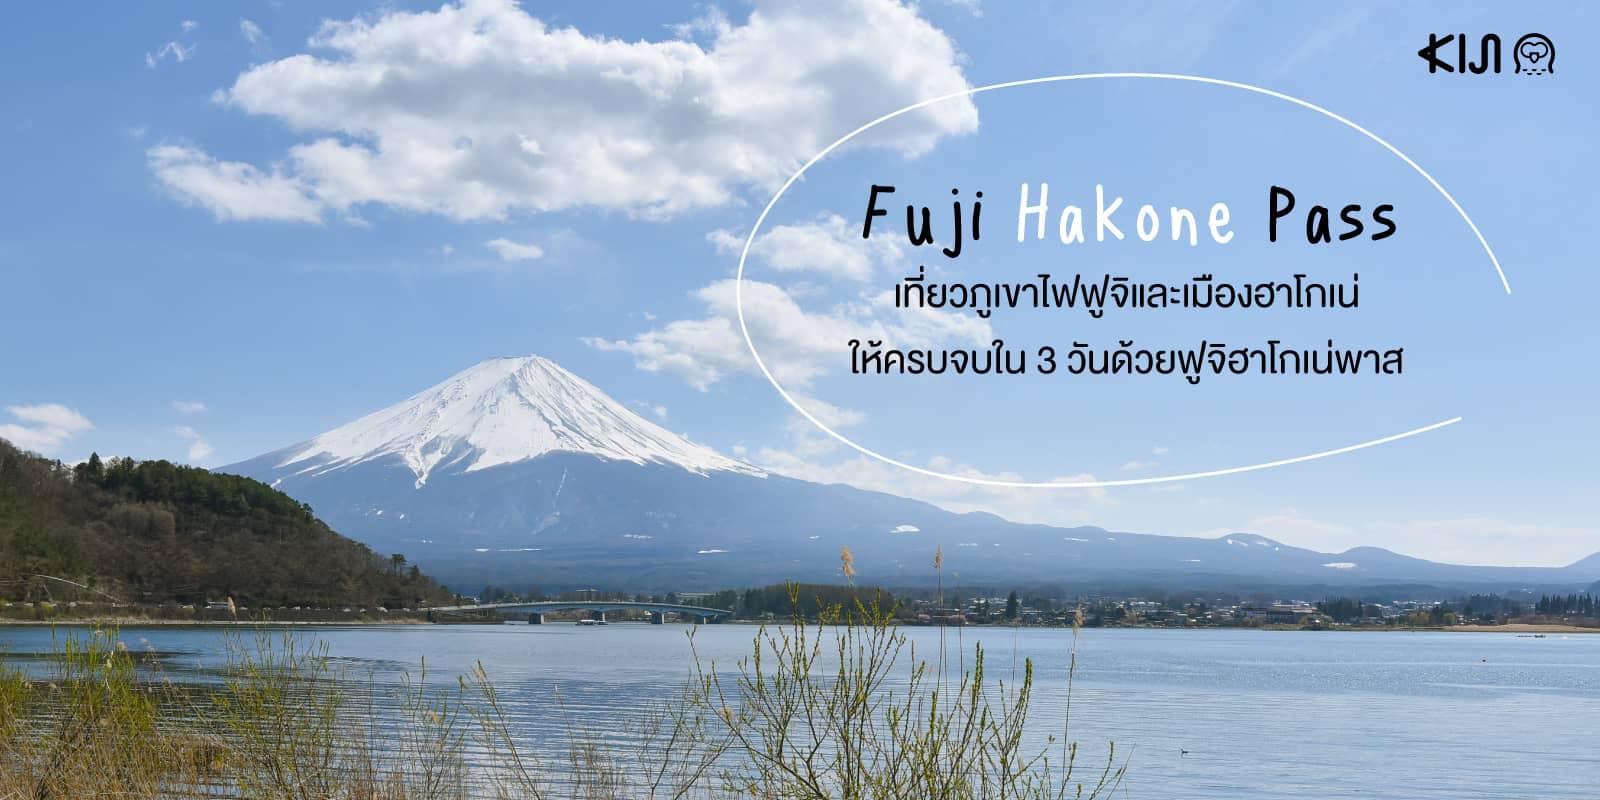 Fuji Hakone Pass เที่ยว ภูเขาไฟฟูจิ ฮาโกเน่